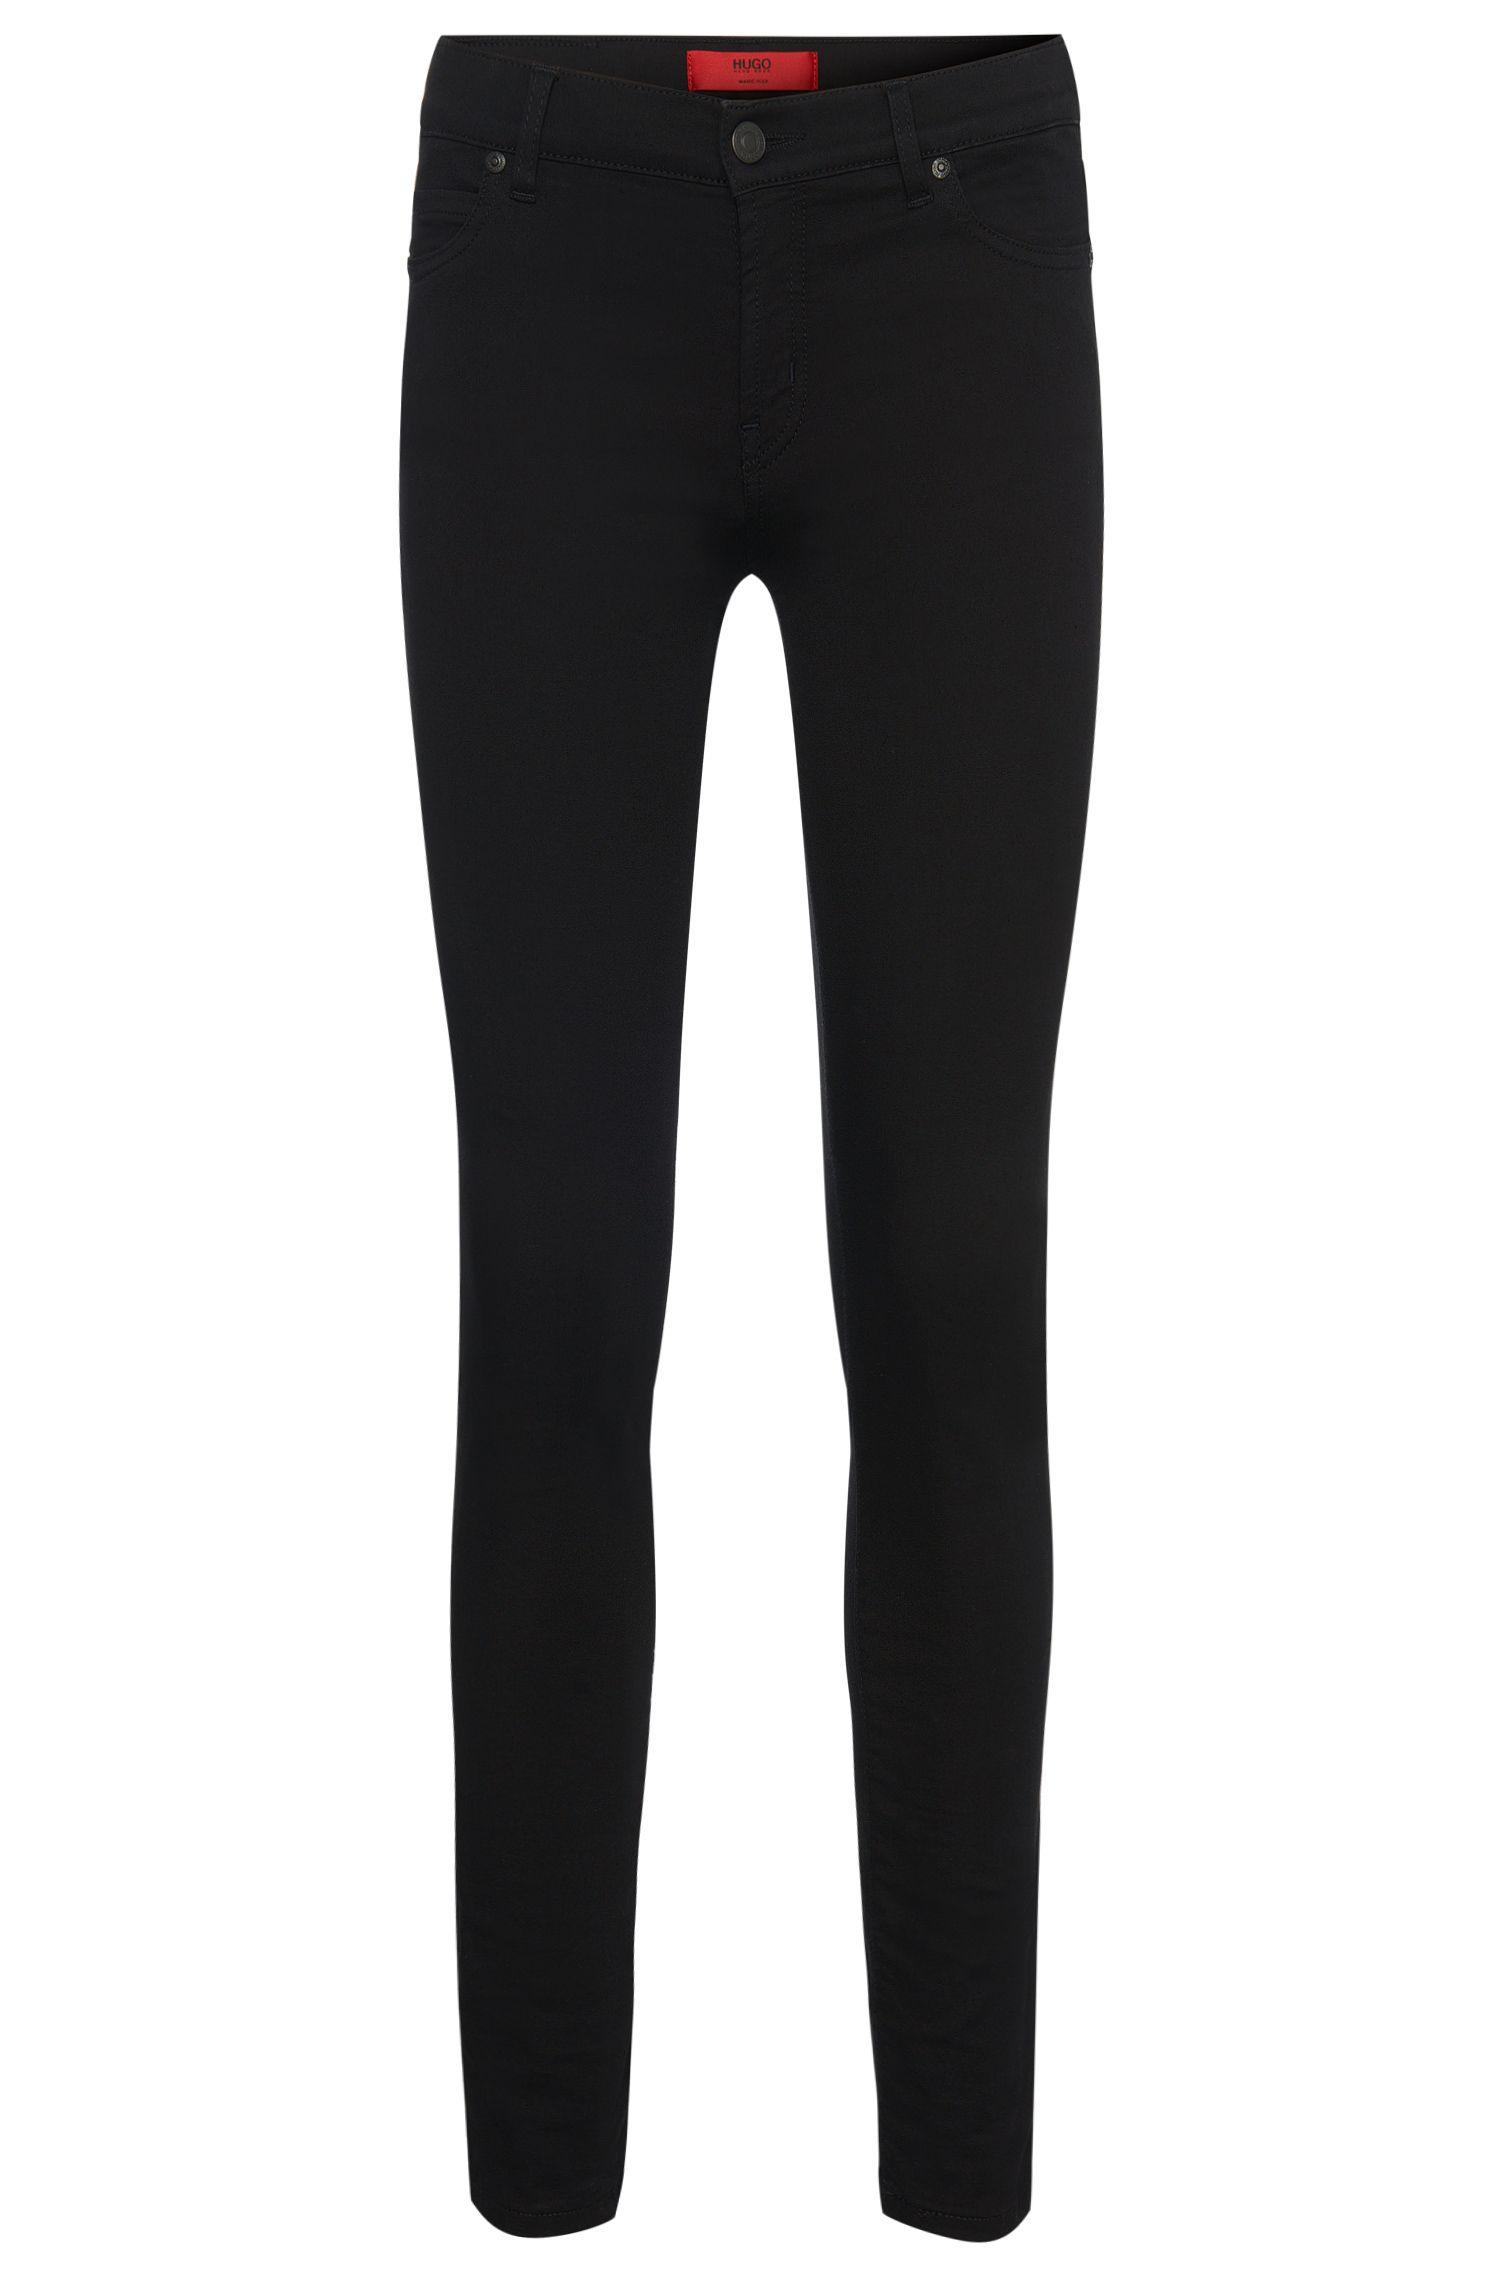 'Georgina' | Stretch Cotton Blend Mid-Rise Jeans